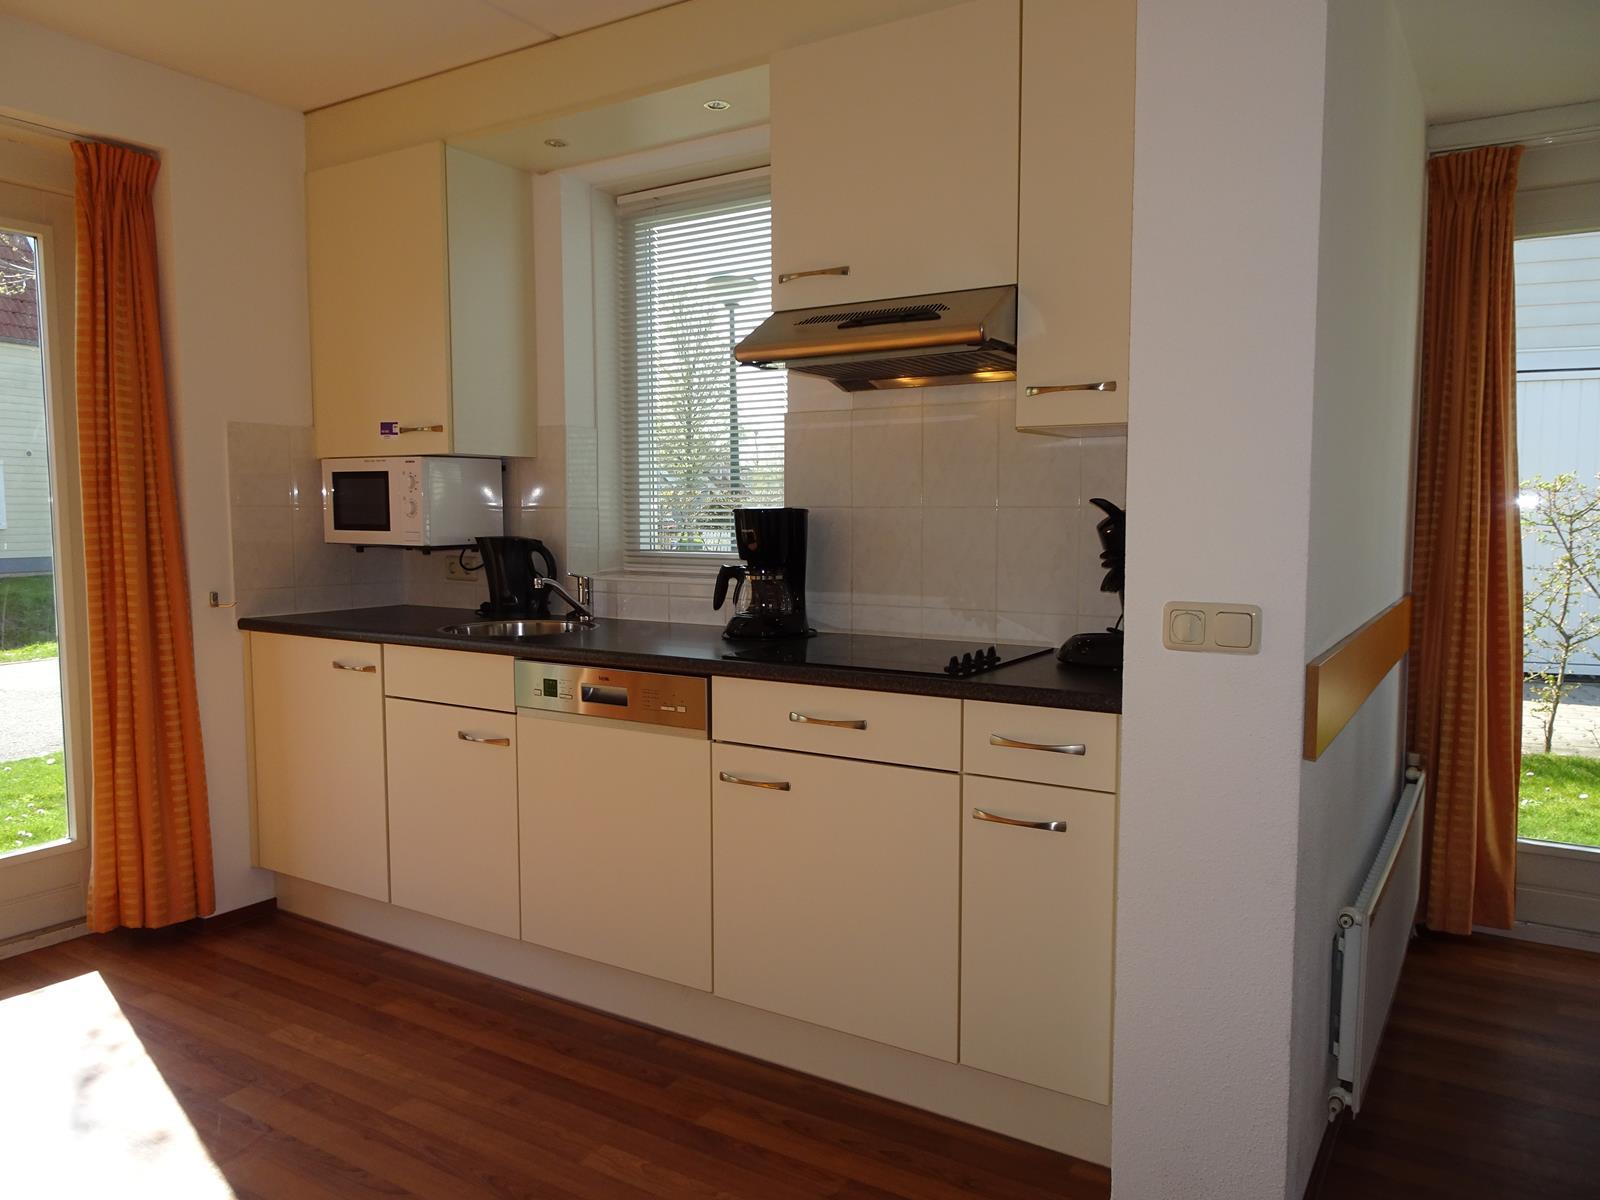 Vakantiehuis te koop Zeeland Bruinisse K41 (11).jpg